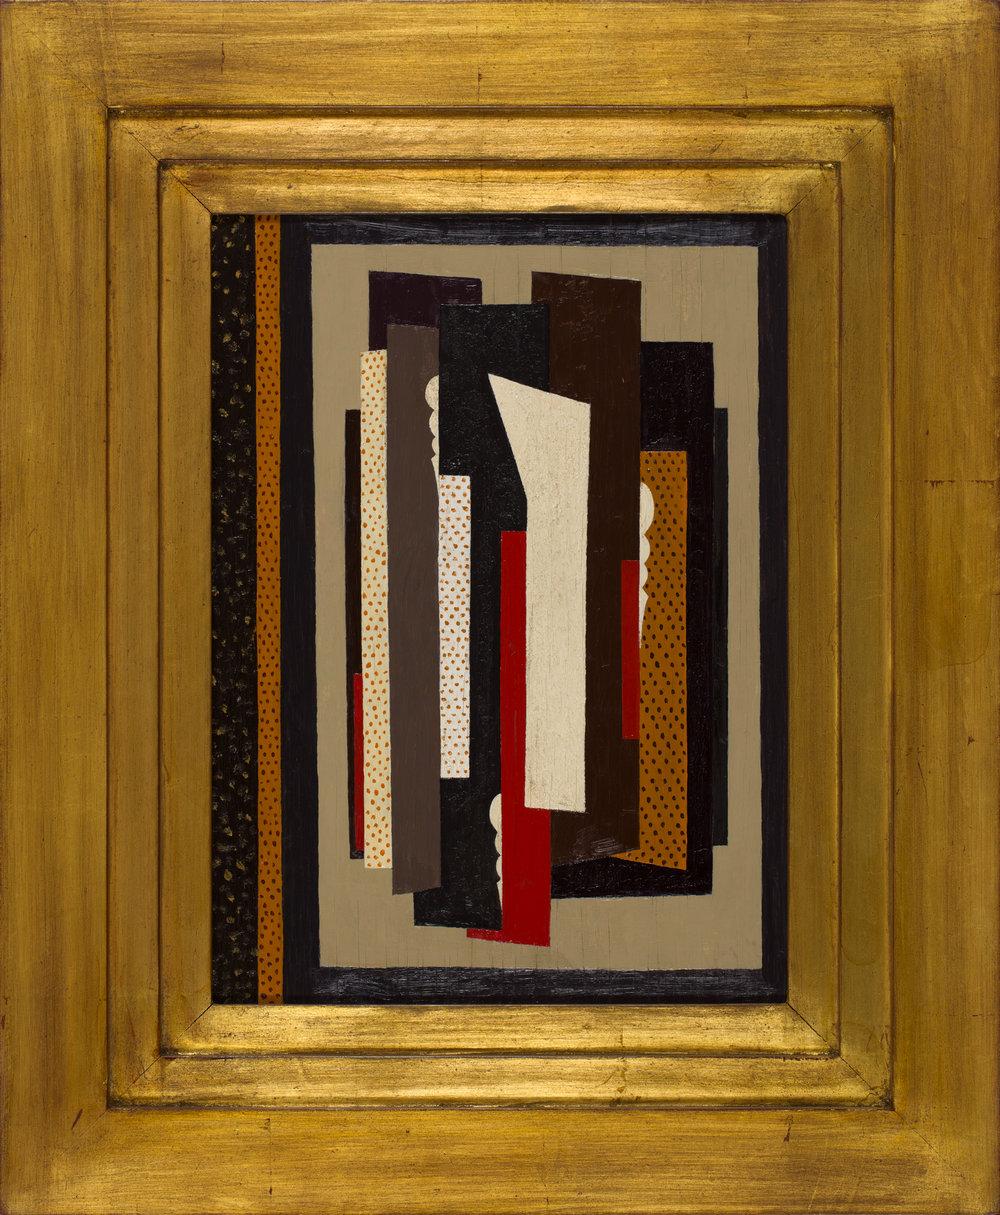 Knut Lundström   Nature morte (Accord)  1922–24 Oil on panel 44 x 32 cm